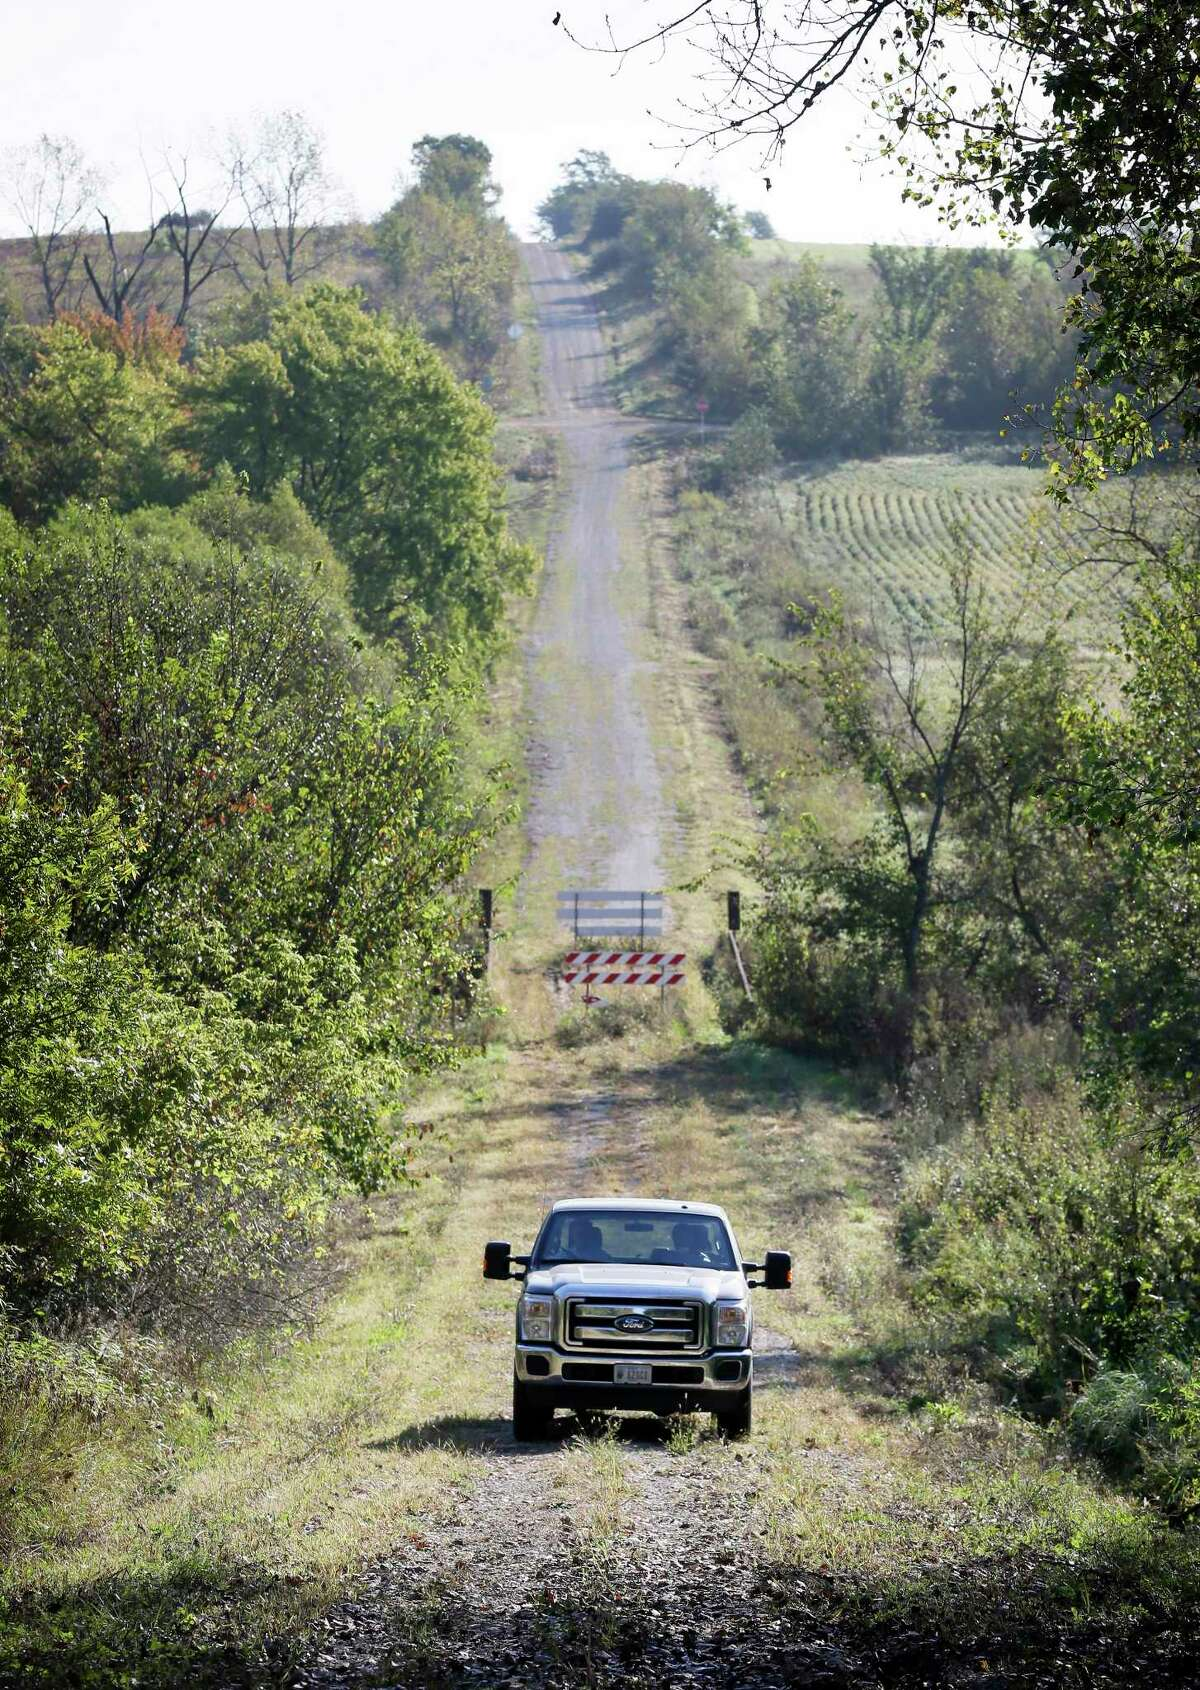 Duane Ohnemus drives his truck away from a closed bridge on a dirt road near his farm in Milo, Iowa.